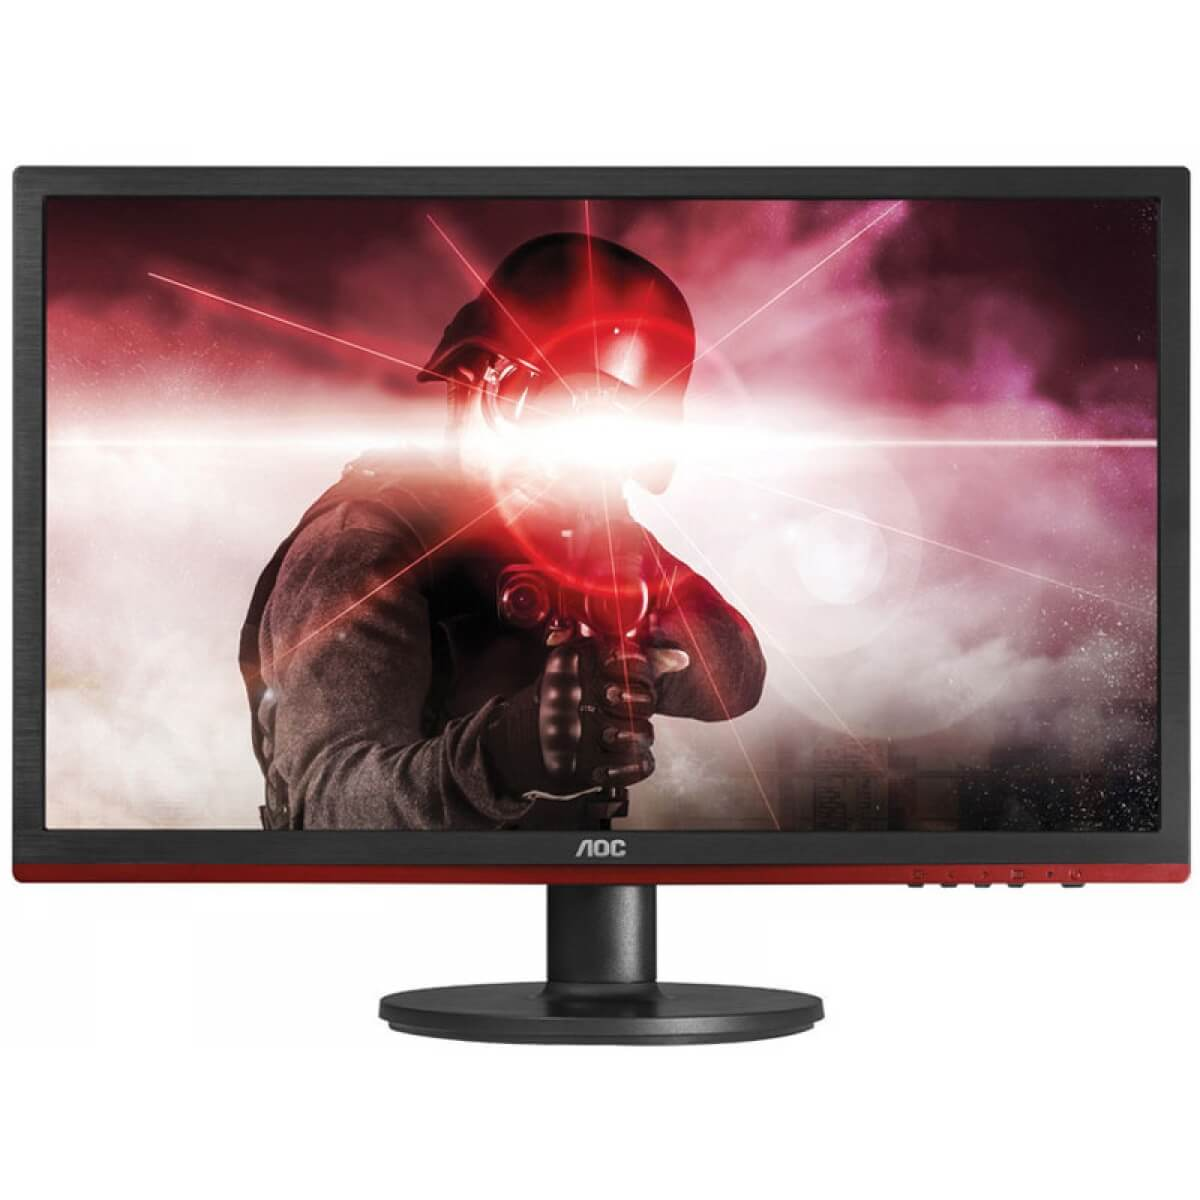 Monitor AOC Gamer 21,5 FULL HD 1MS 75HZ Freesync G2260VWQ6